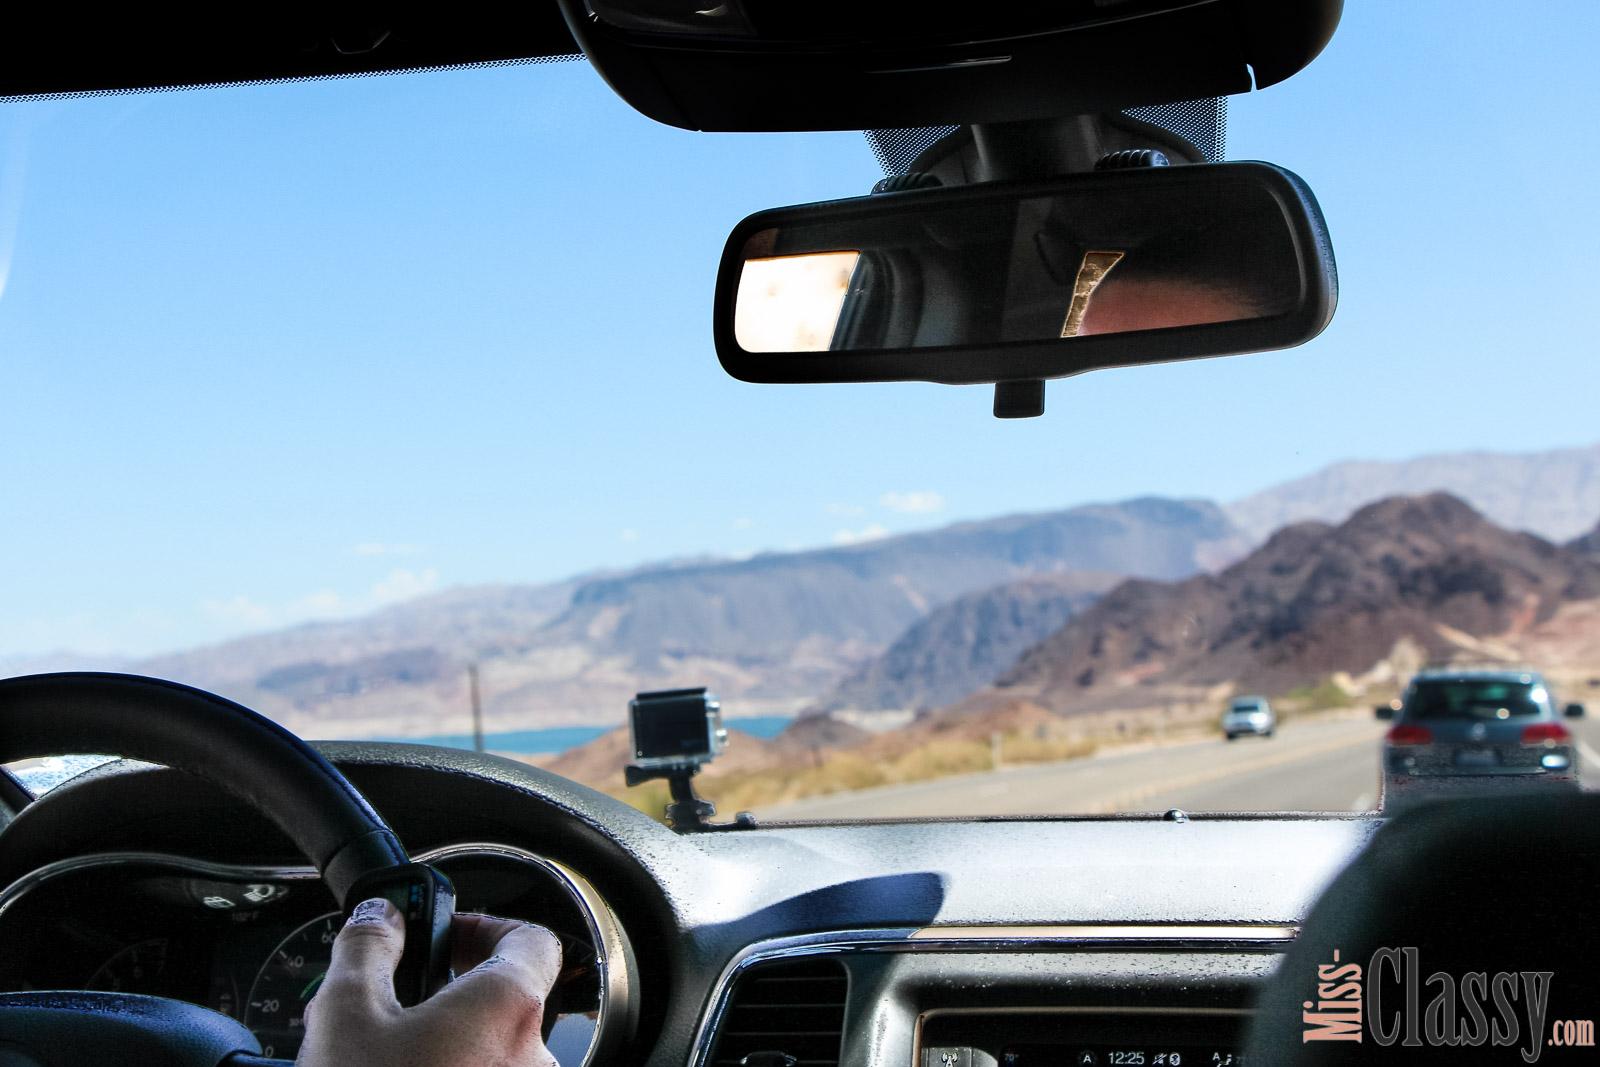 TRAVEL Hoover Dam und Lake Mead, Miss Classy, miss-classy.com, Lifestyleblog, Lifestyleblogger, Lifestyleblog Graz, Travelblog, Travelblogger, Graz, Steiermark, Österreich, classy, beclassy, Reise, Travel, Wanderlust, Wayfarer, Roadtrip, USA, United States of America, Amerika, Las Vegas, Hoover Dam, Lake Mead, Hoover Talsperre